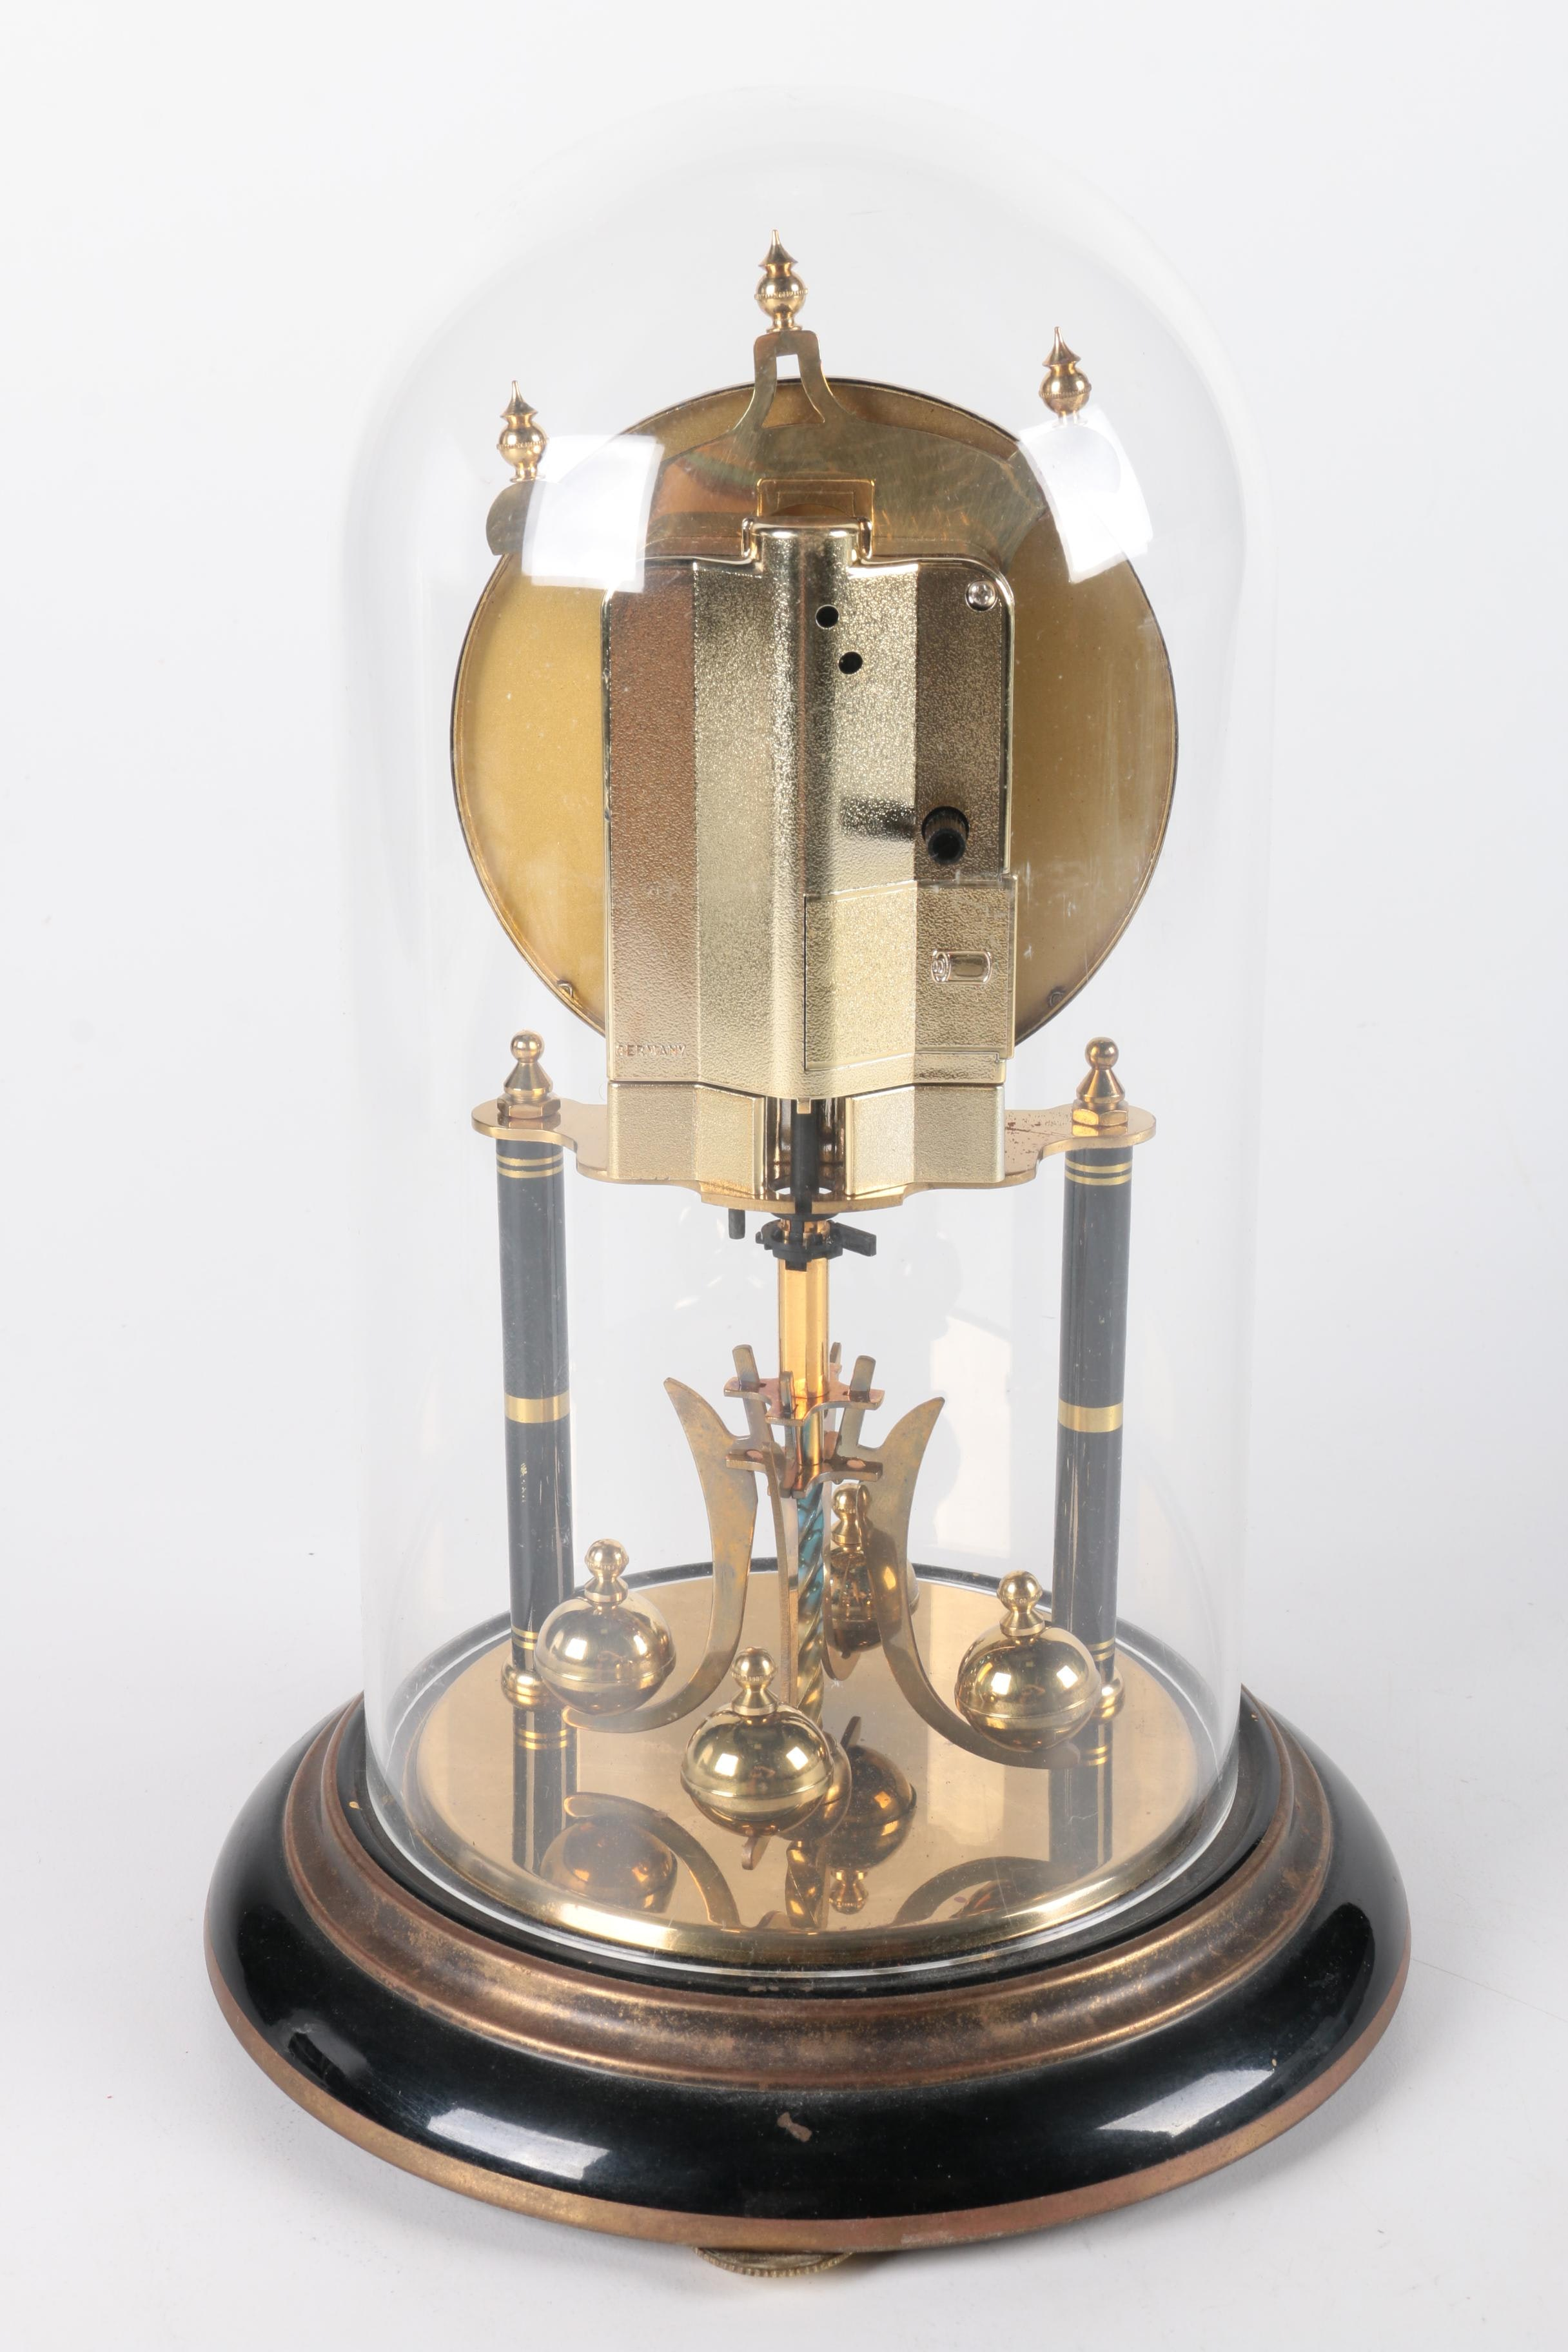 Kleninger Amp Obergfel Kundo Anniversary Clock Ebth